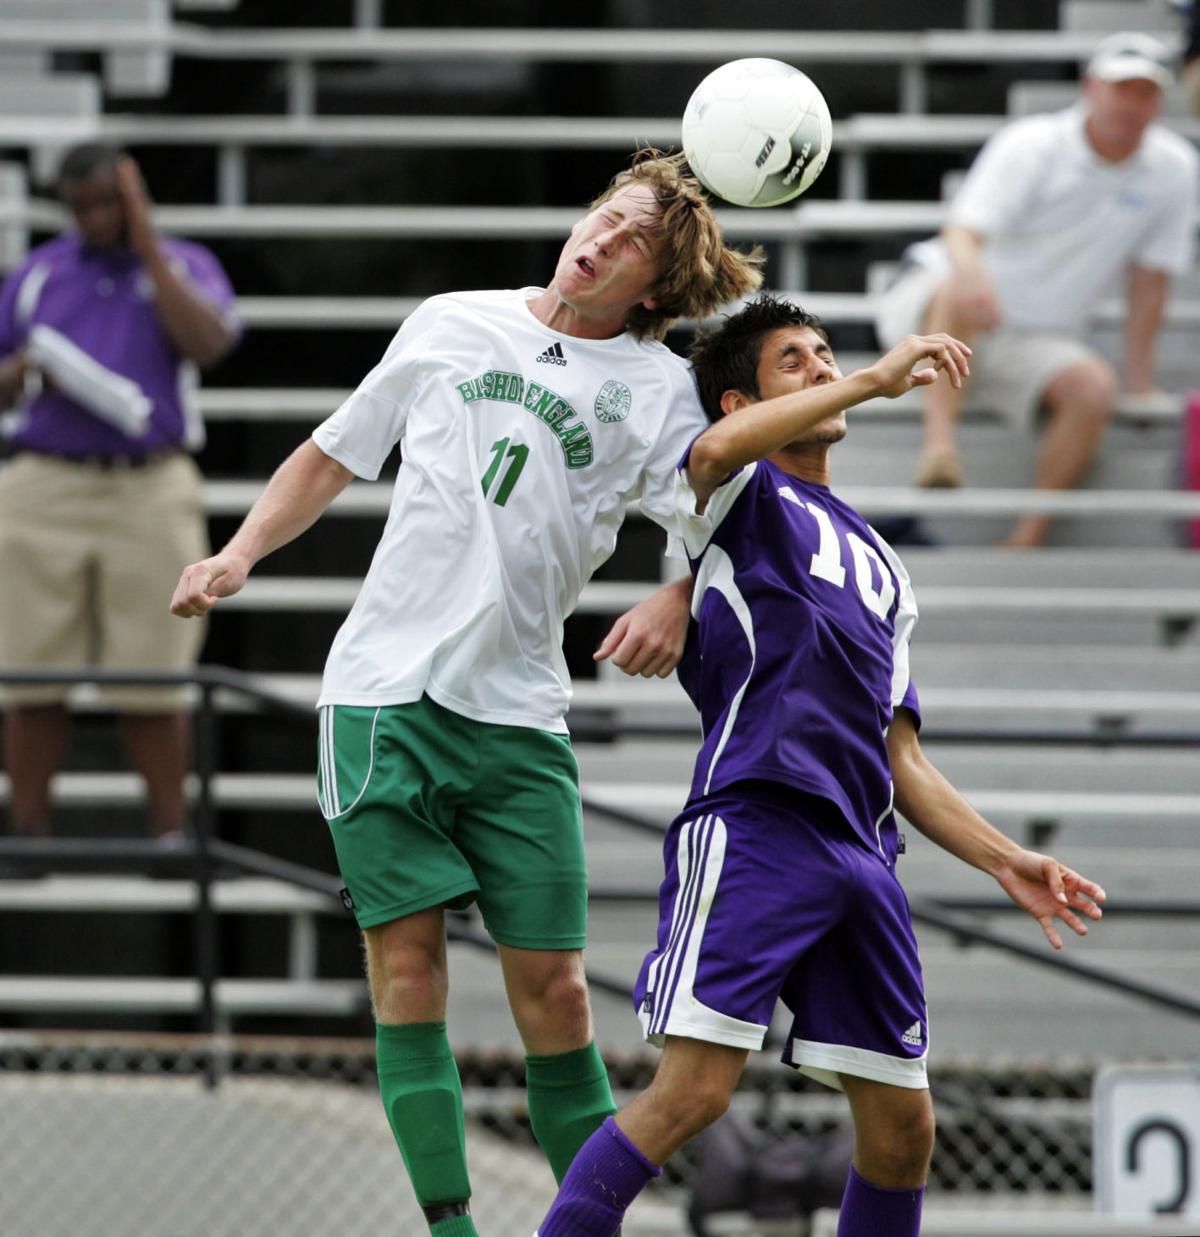 Bishop England falls to Batesburg-Leesville in Boys Soccer